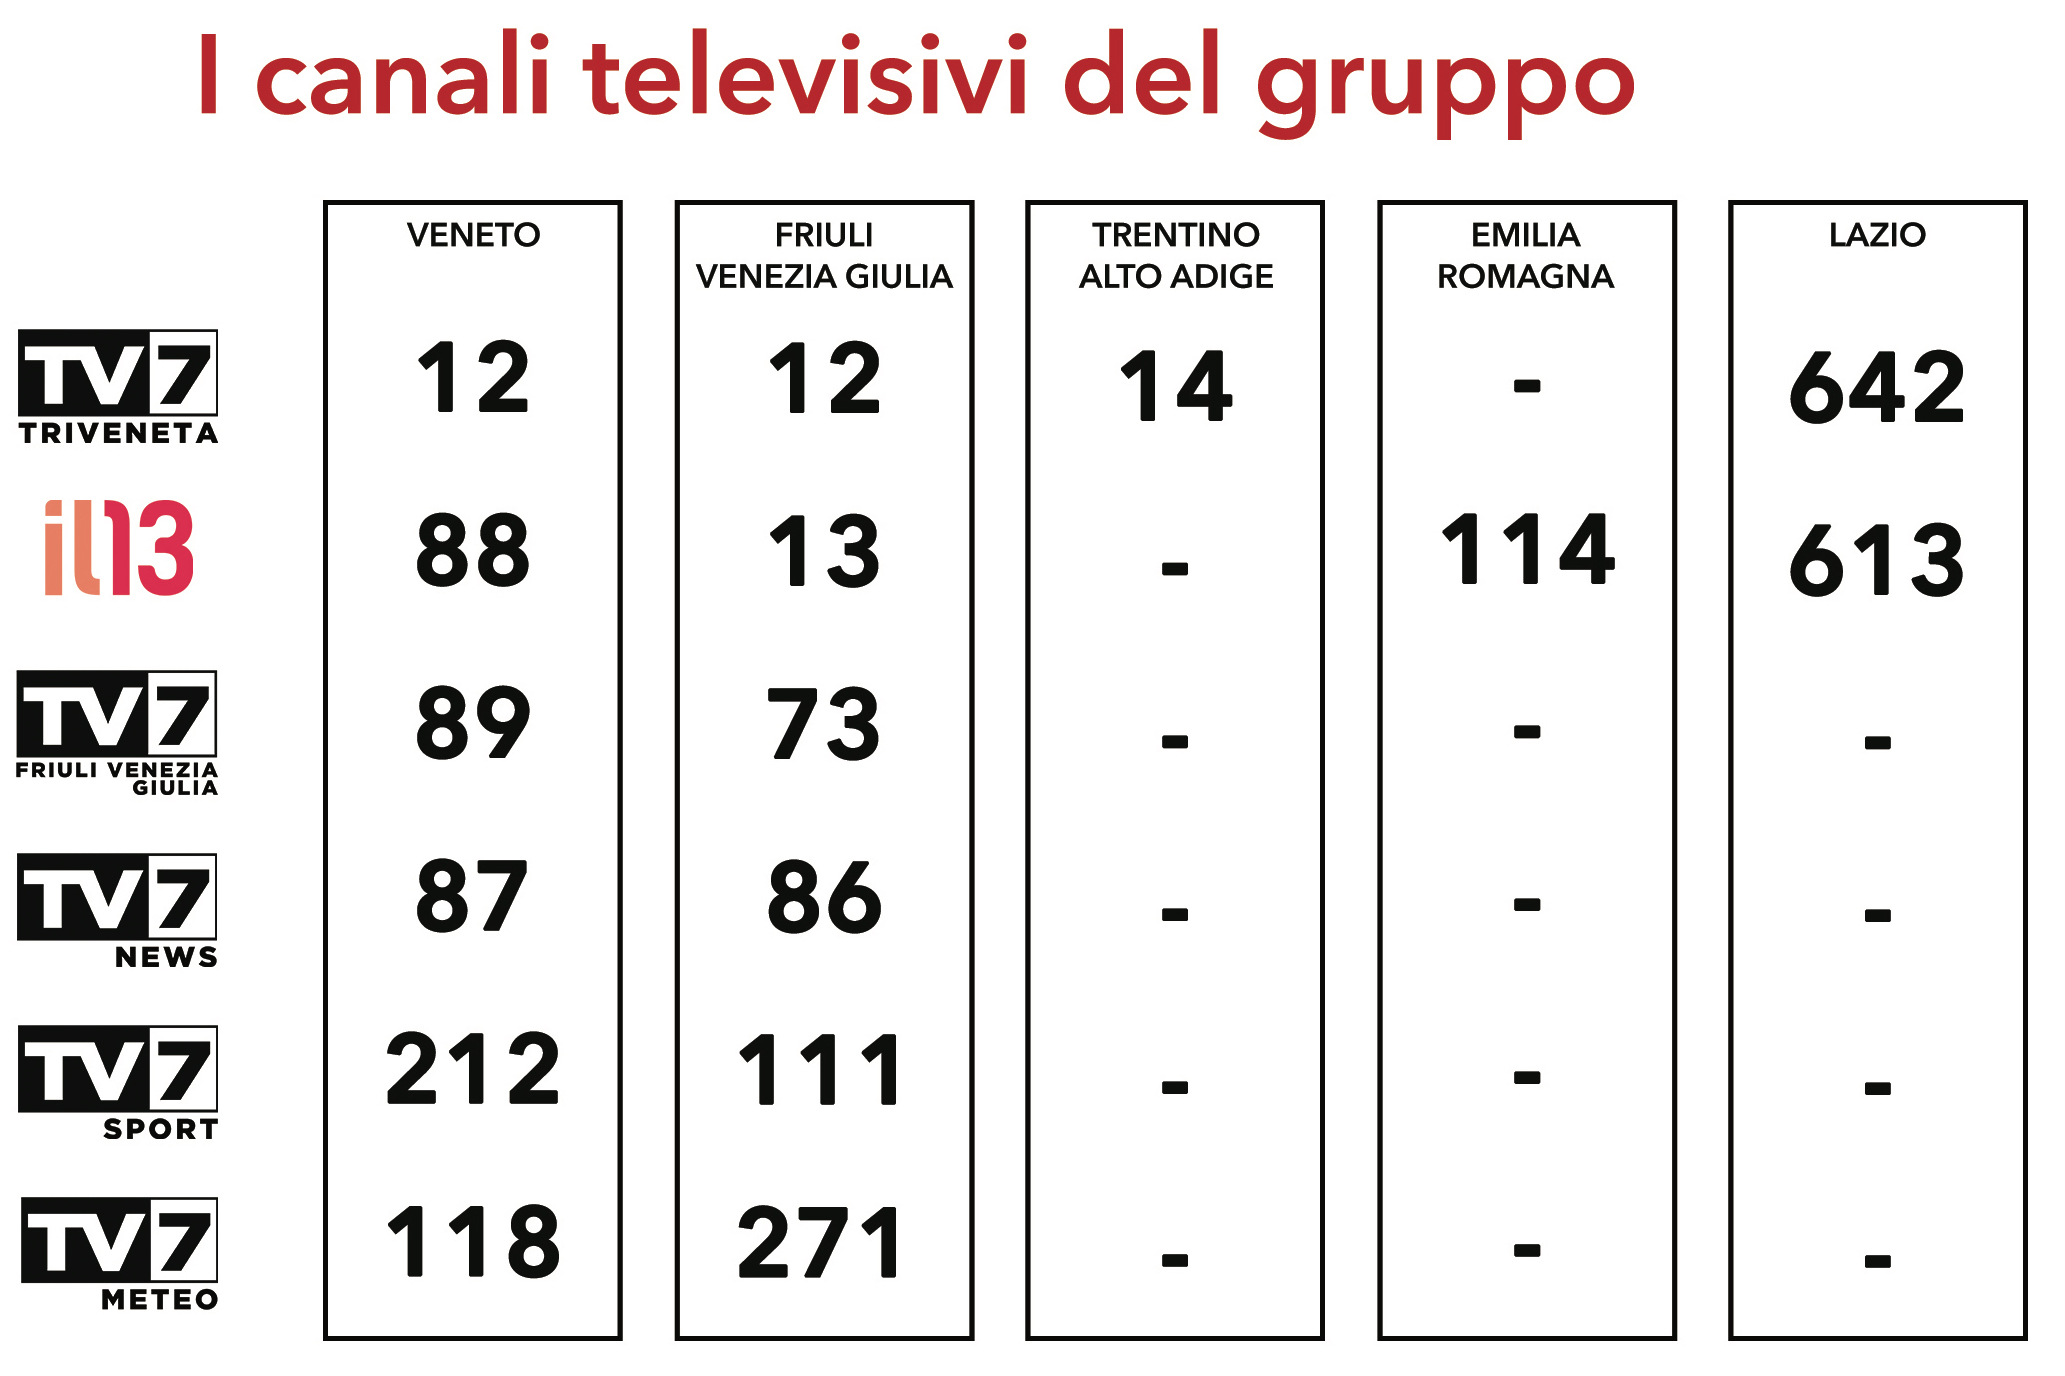 TV7-Triveneta-Televisione-Copertura-e-LCN-CanaliTelevisivi-05-2021